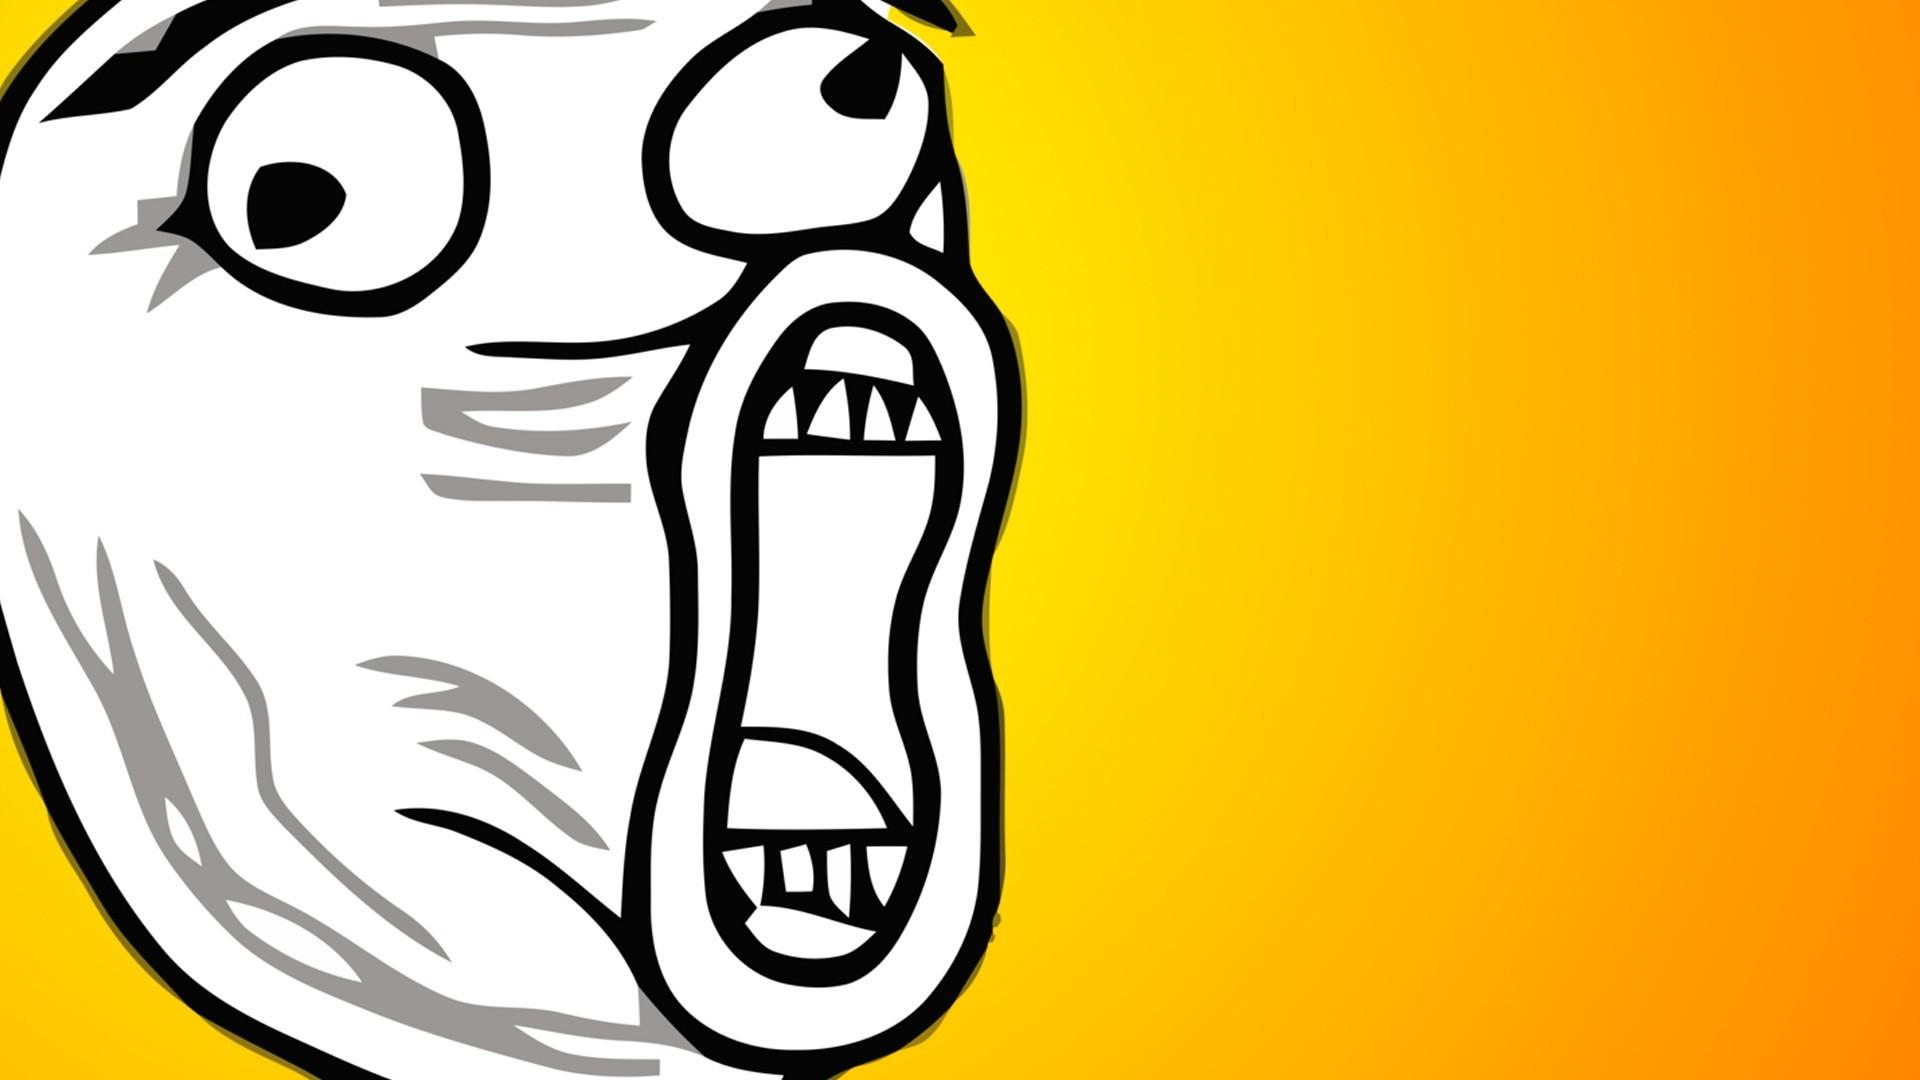 Wallpaper illustration simple background logo cartoon brand illustration simple background logo cartoon brand troll face font voltagebd Choice Image